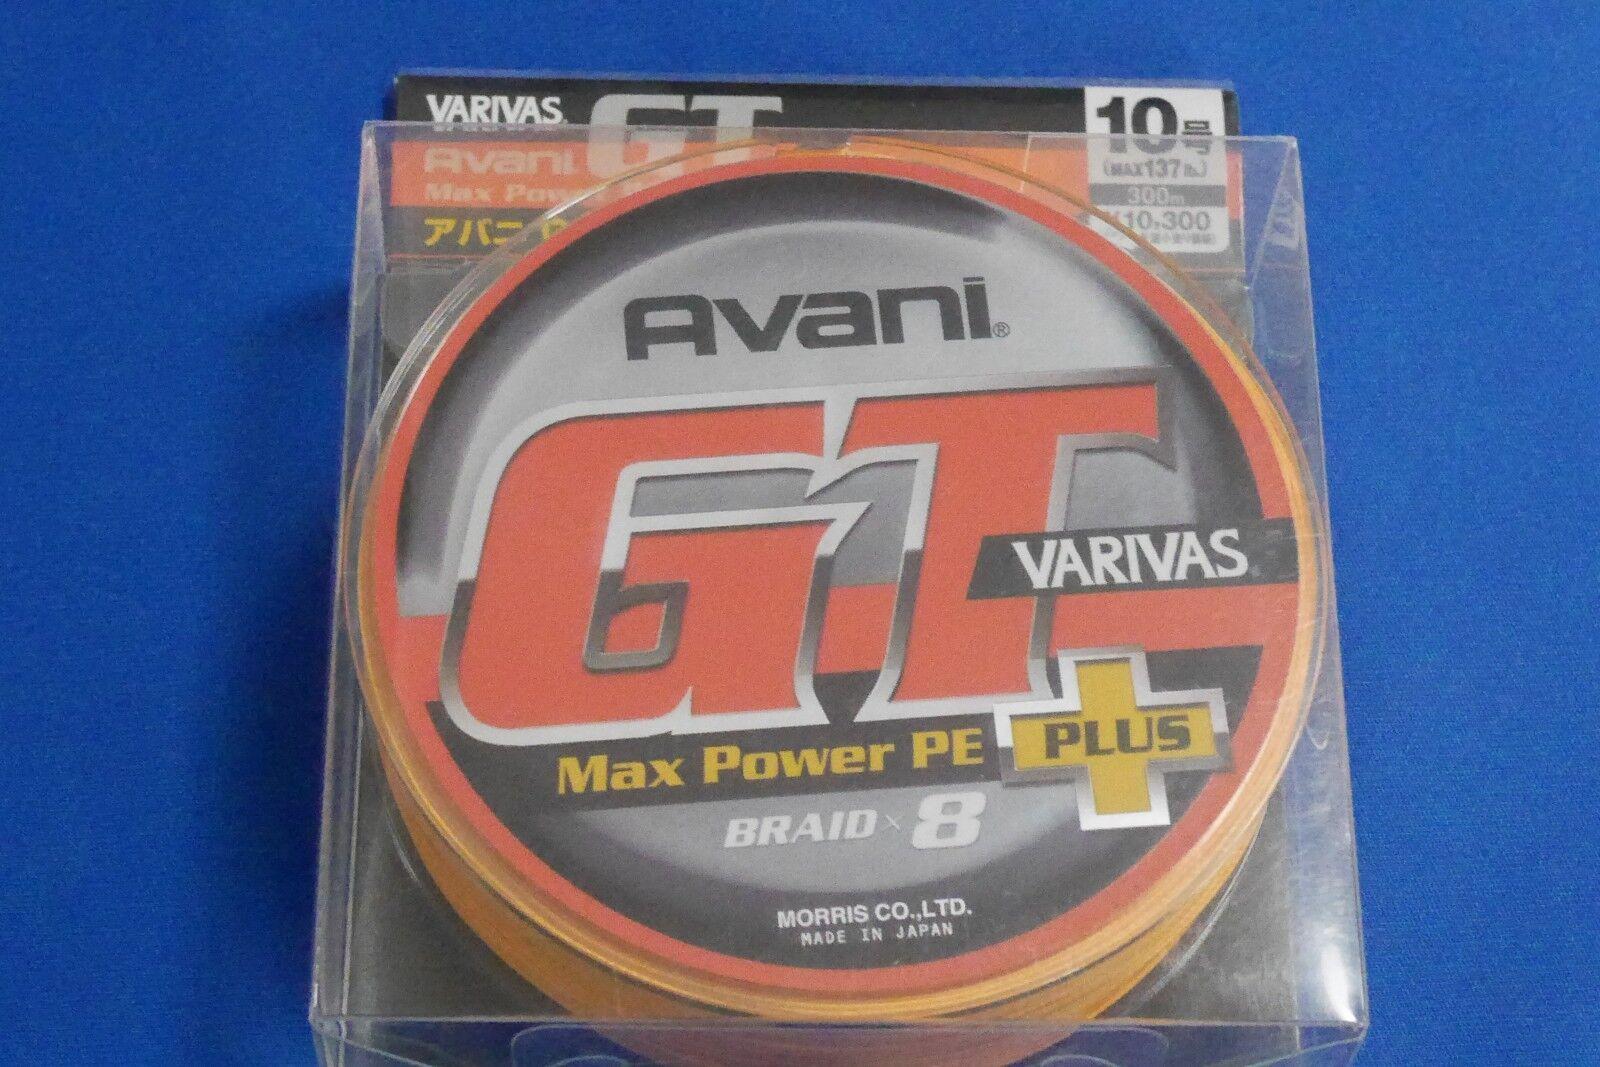 MORRIS PE Line VARIVAS Avani GT Max energia Plus 300m  10 137lb Fishing Line